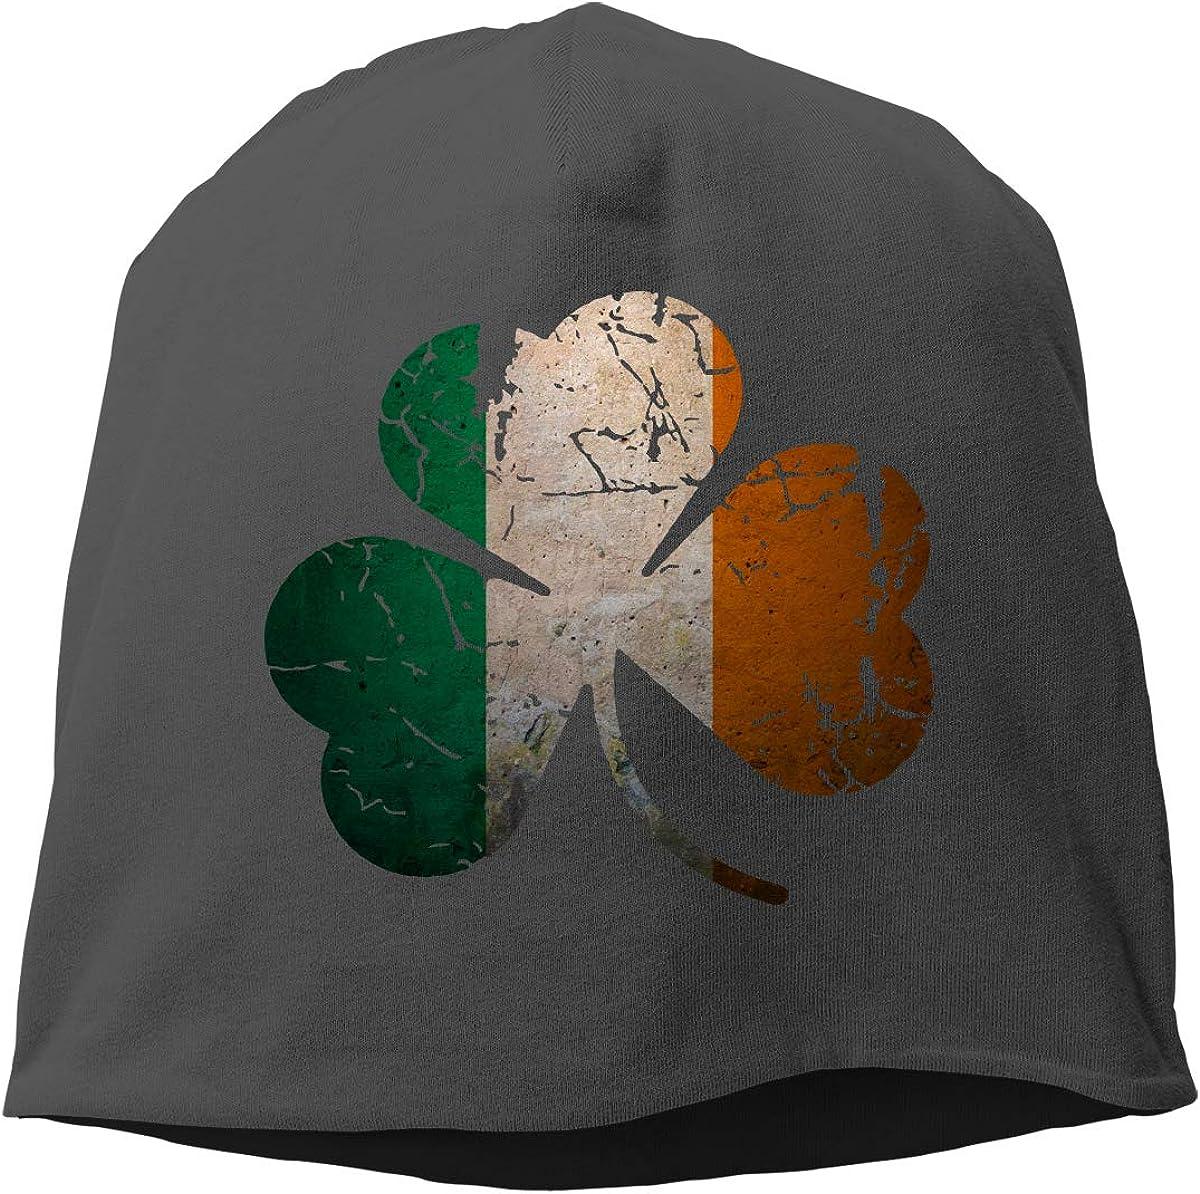 Winter Warm Daily Hat Vintage Irish Shamrock Beanie Skull Cap for Women and Men